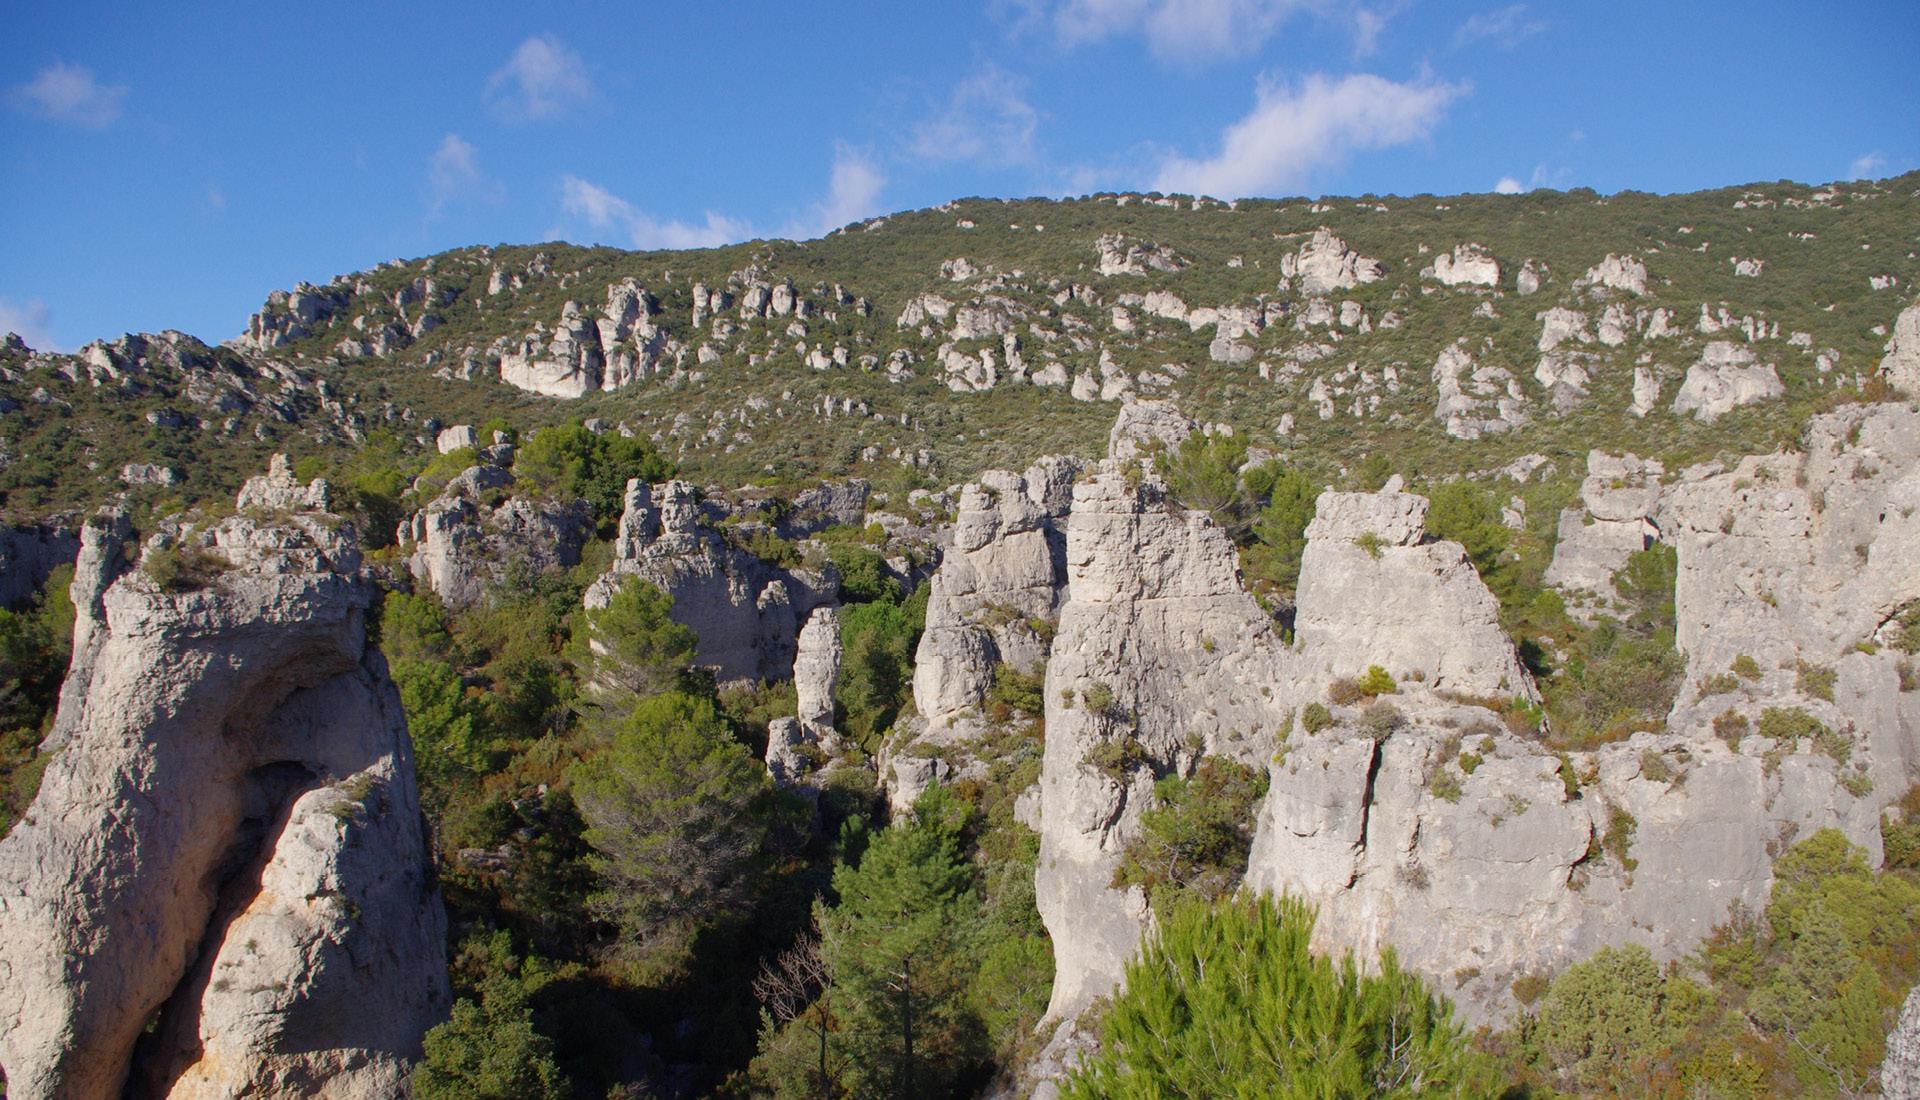 Grand Site Cirque de Mourèze © Maza Flickr